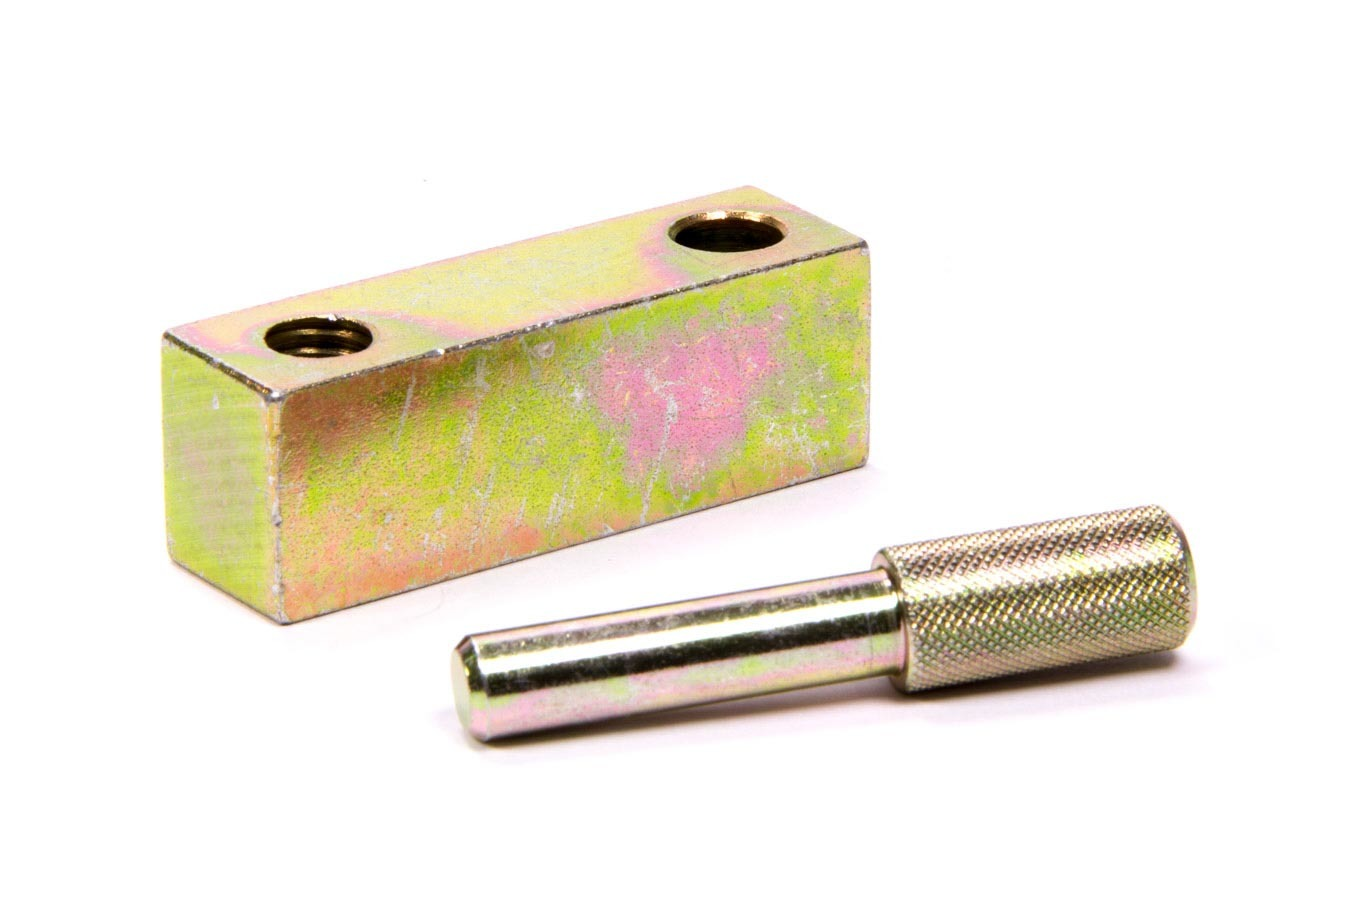 Proform Rocker Stud Remover & Align Tool